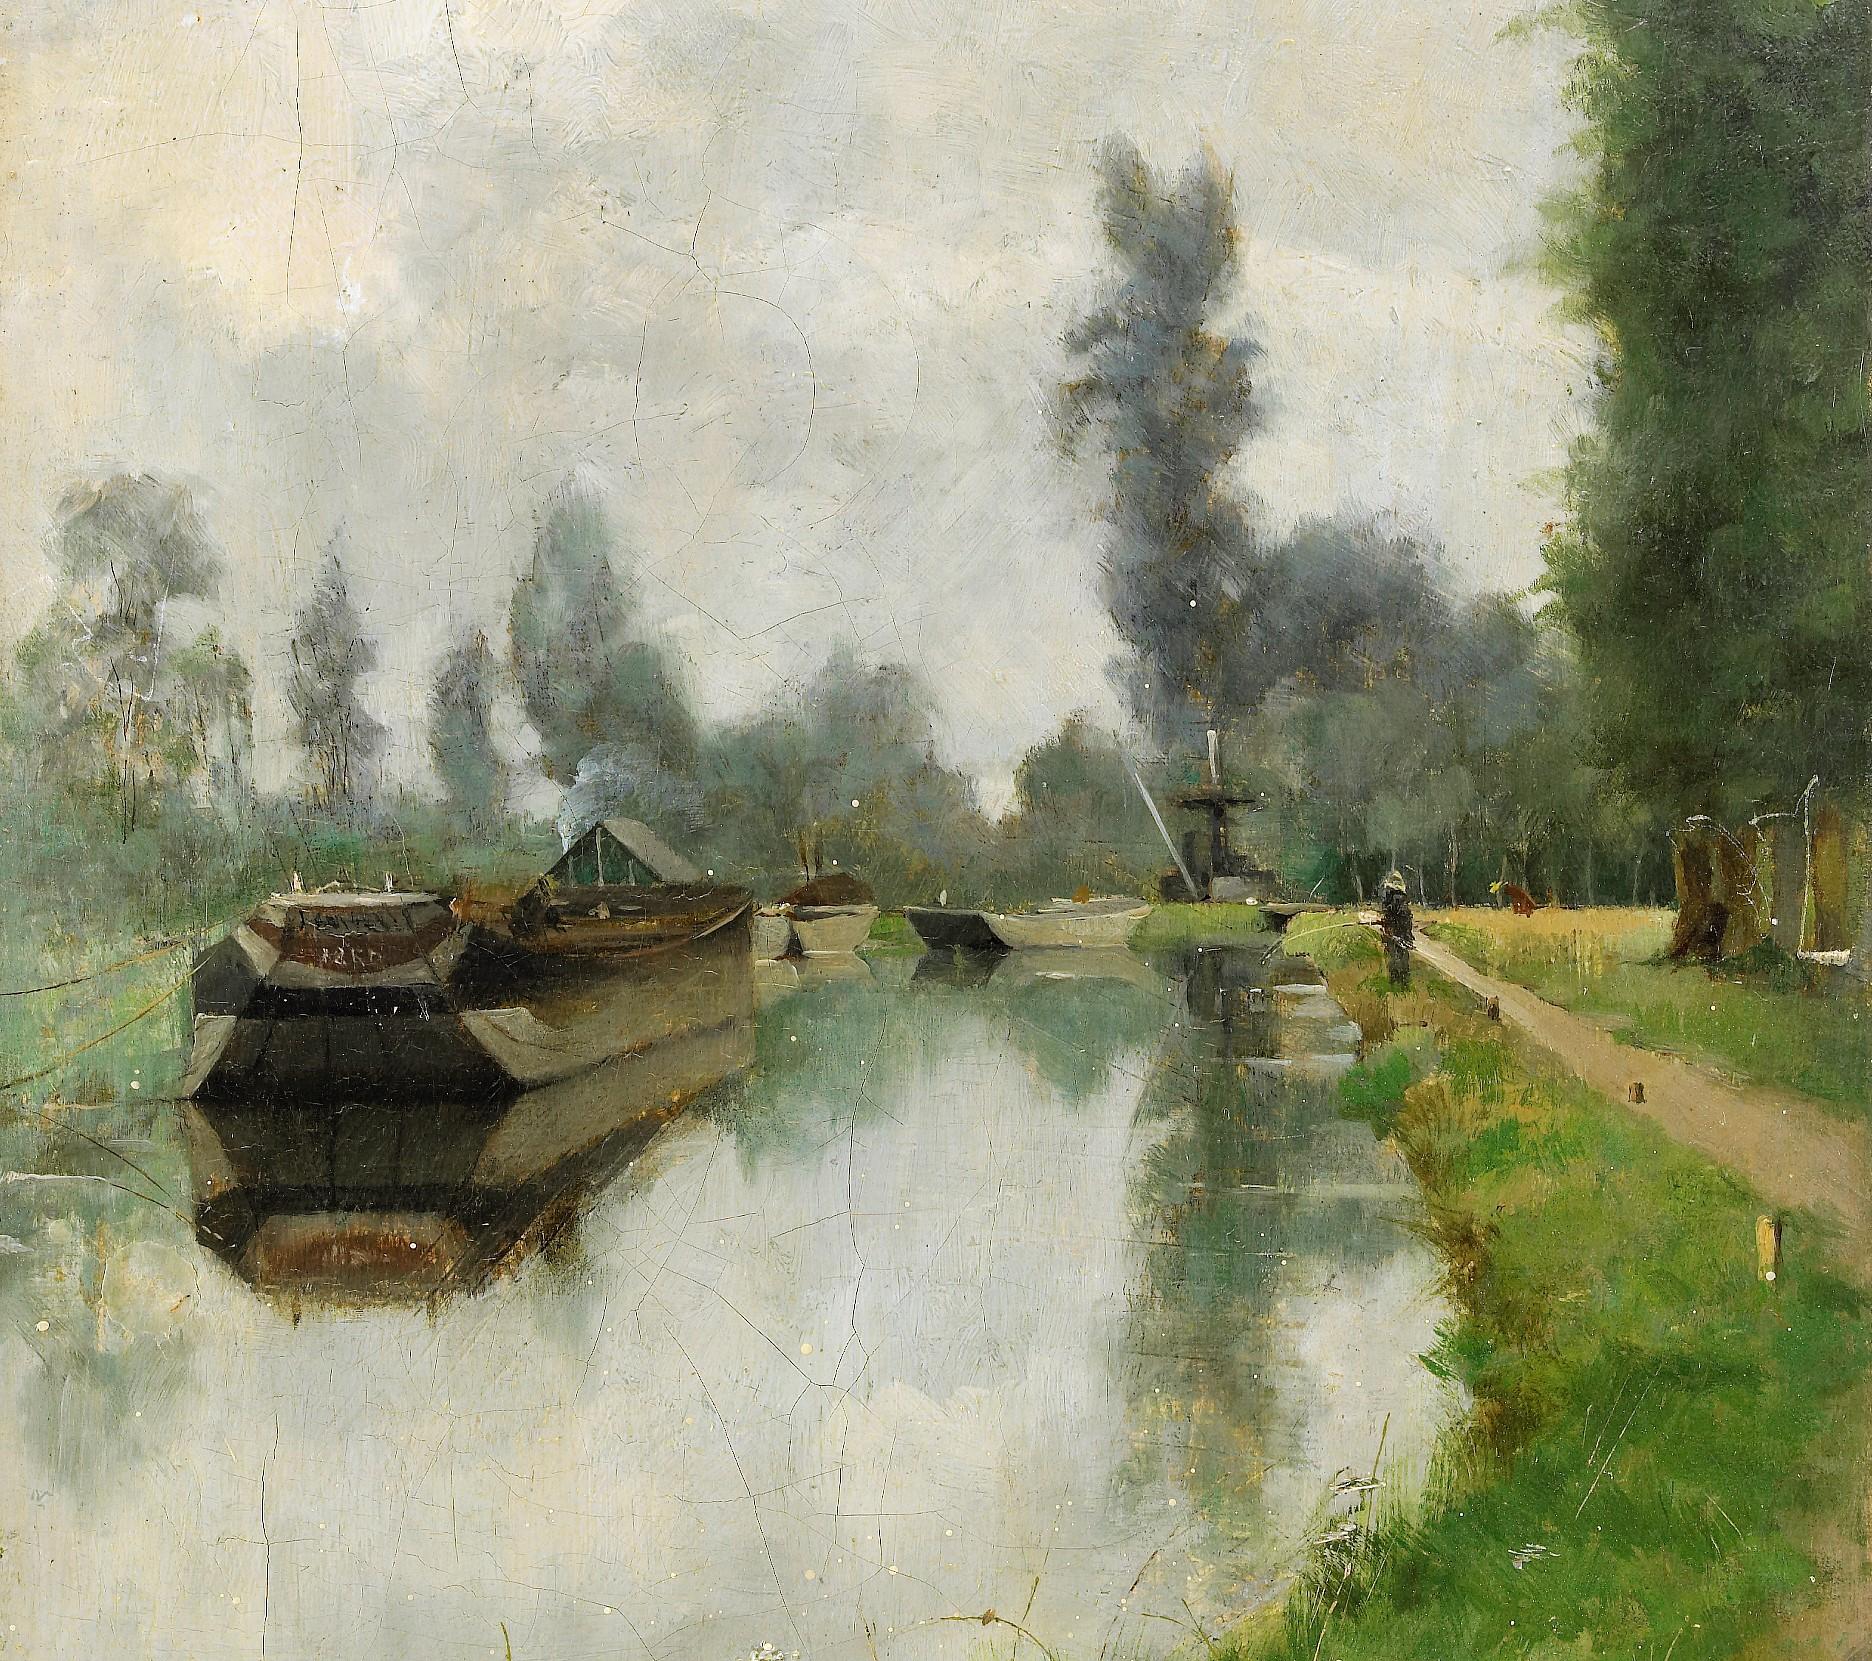 Julia Beck, Vid kanalen, Grez, 1883. Olja på duk. Foto: Stockholms Auktionsverk. Bild beskuren.